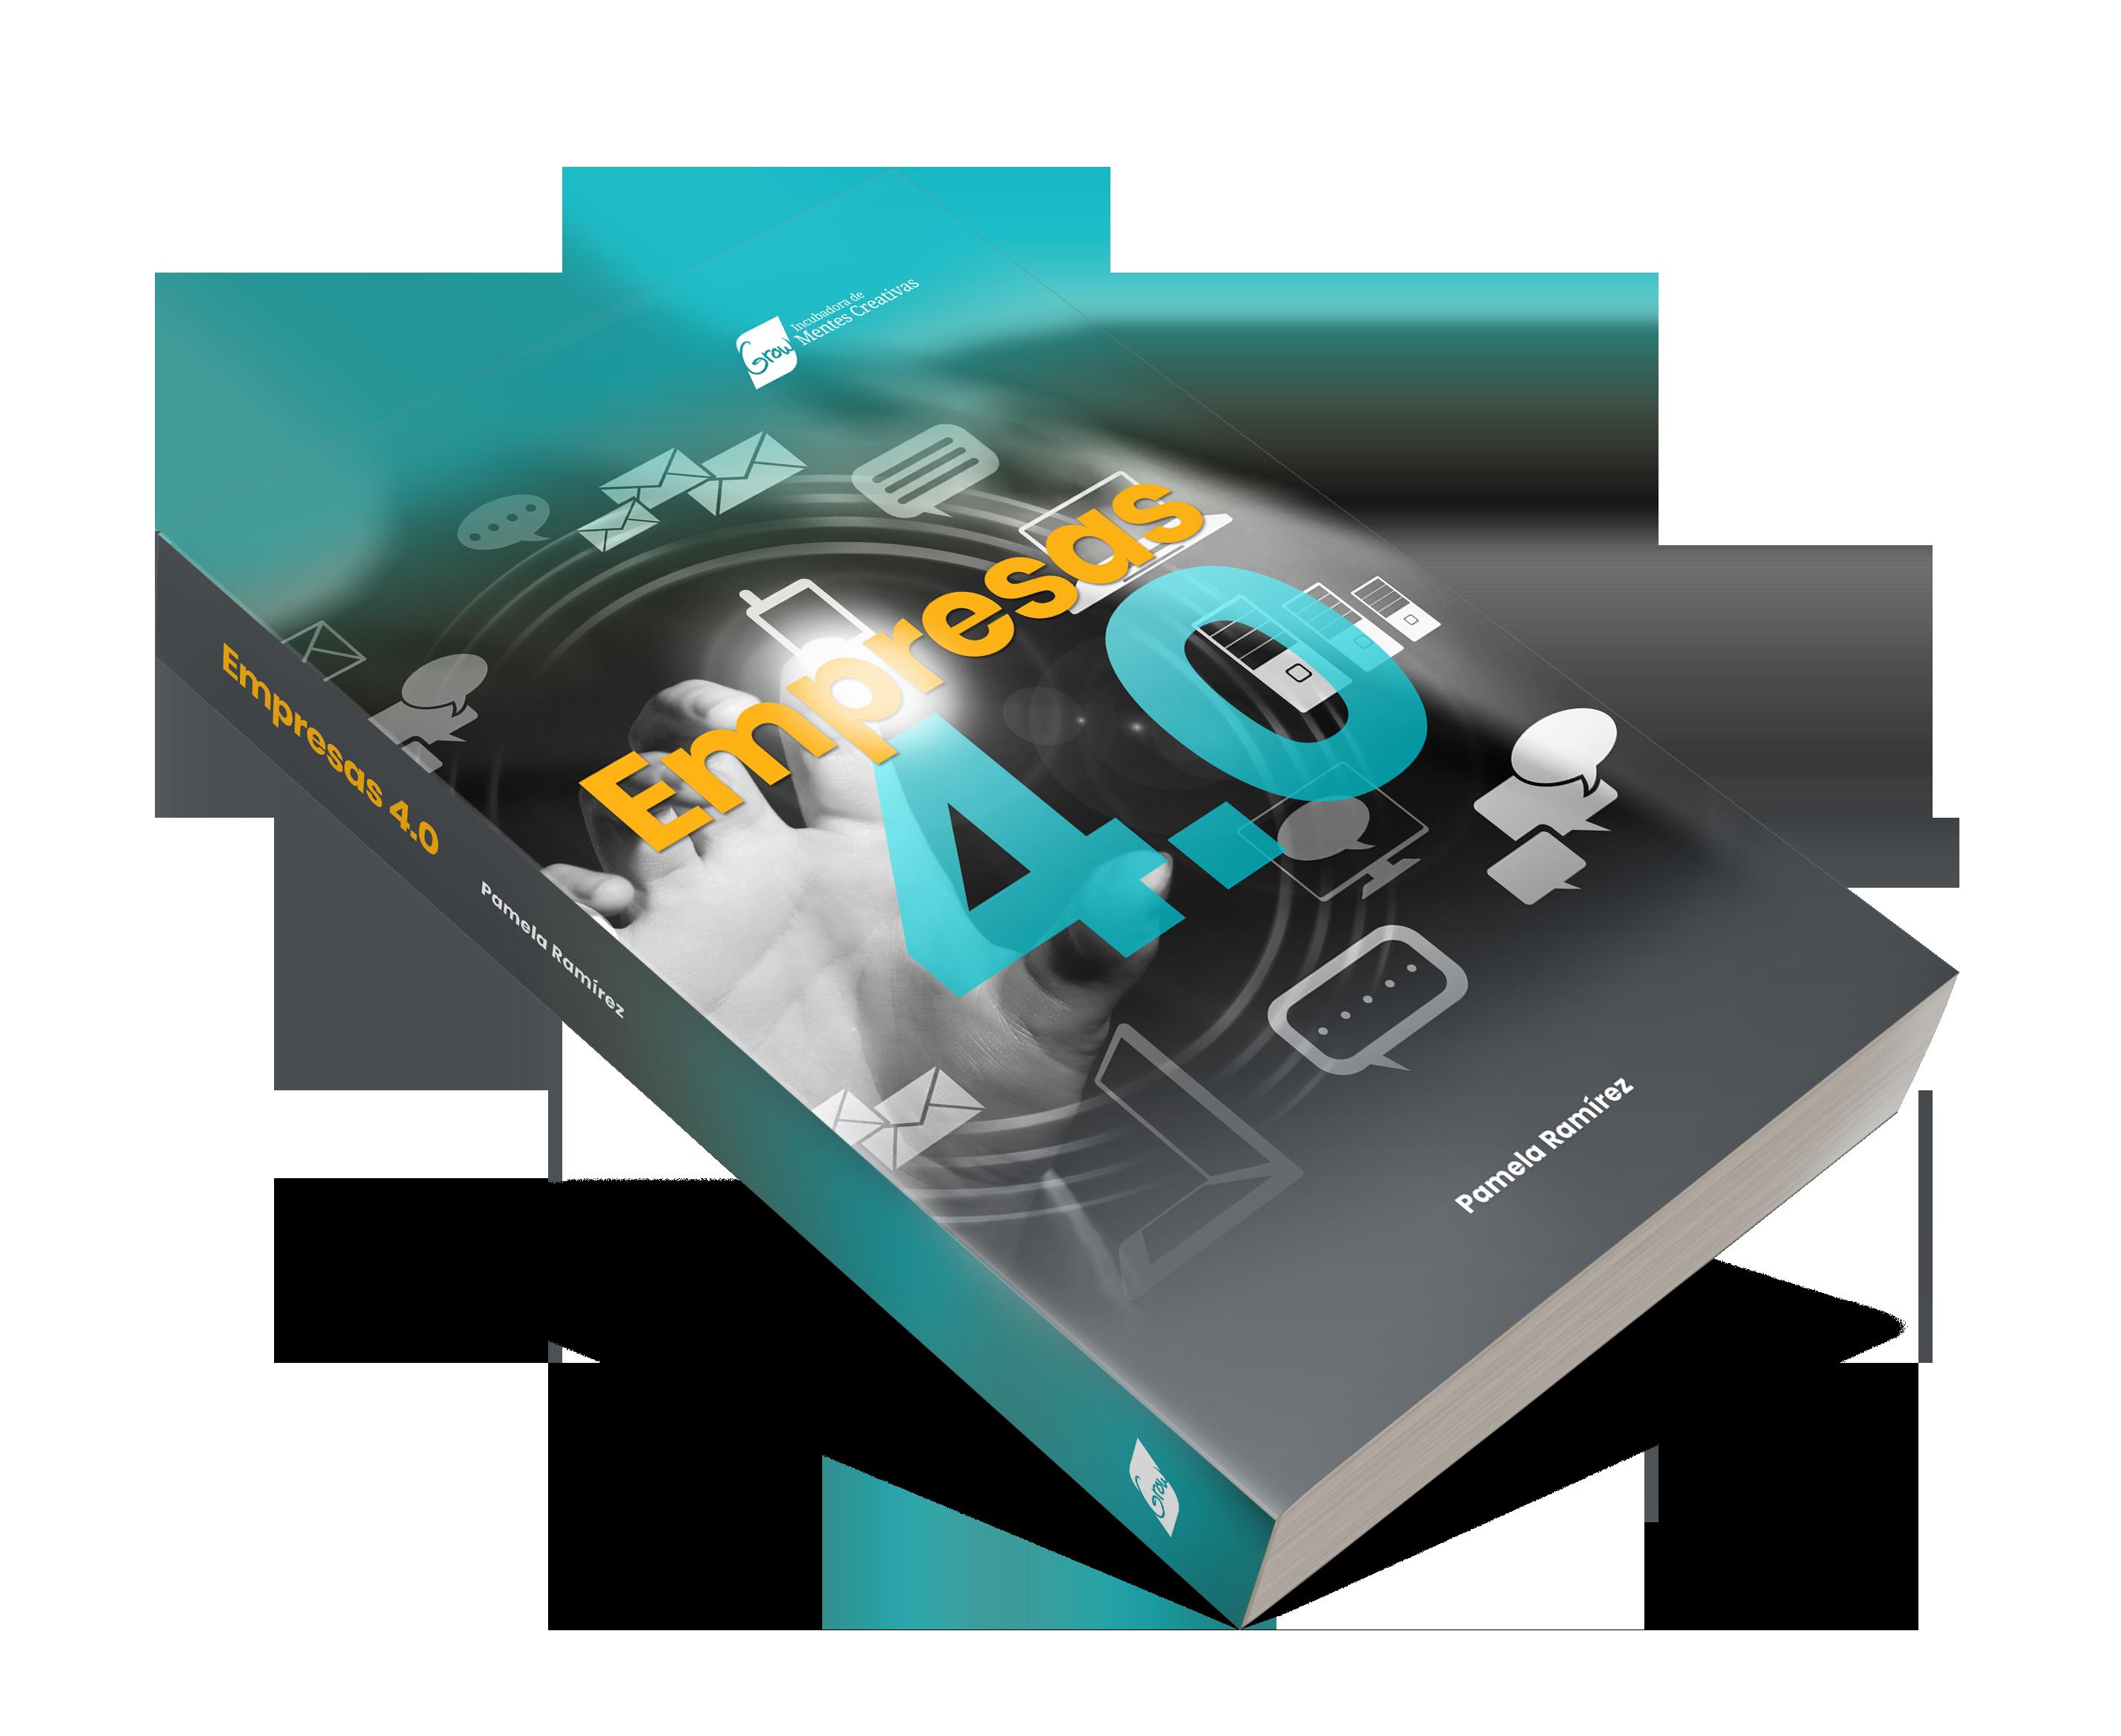 grow-mockup-ebook-empresas40-02